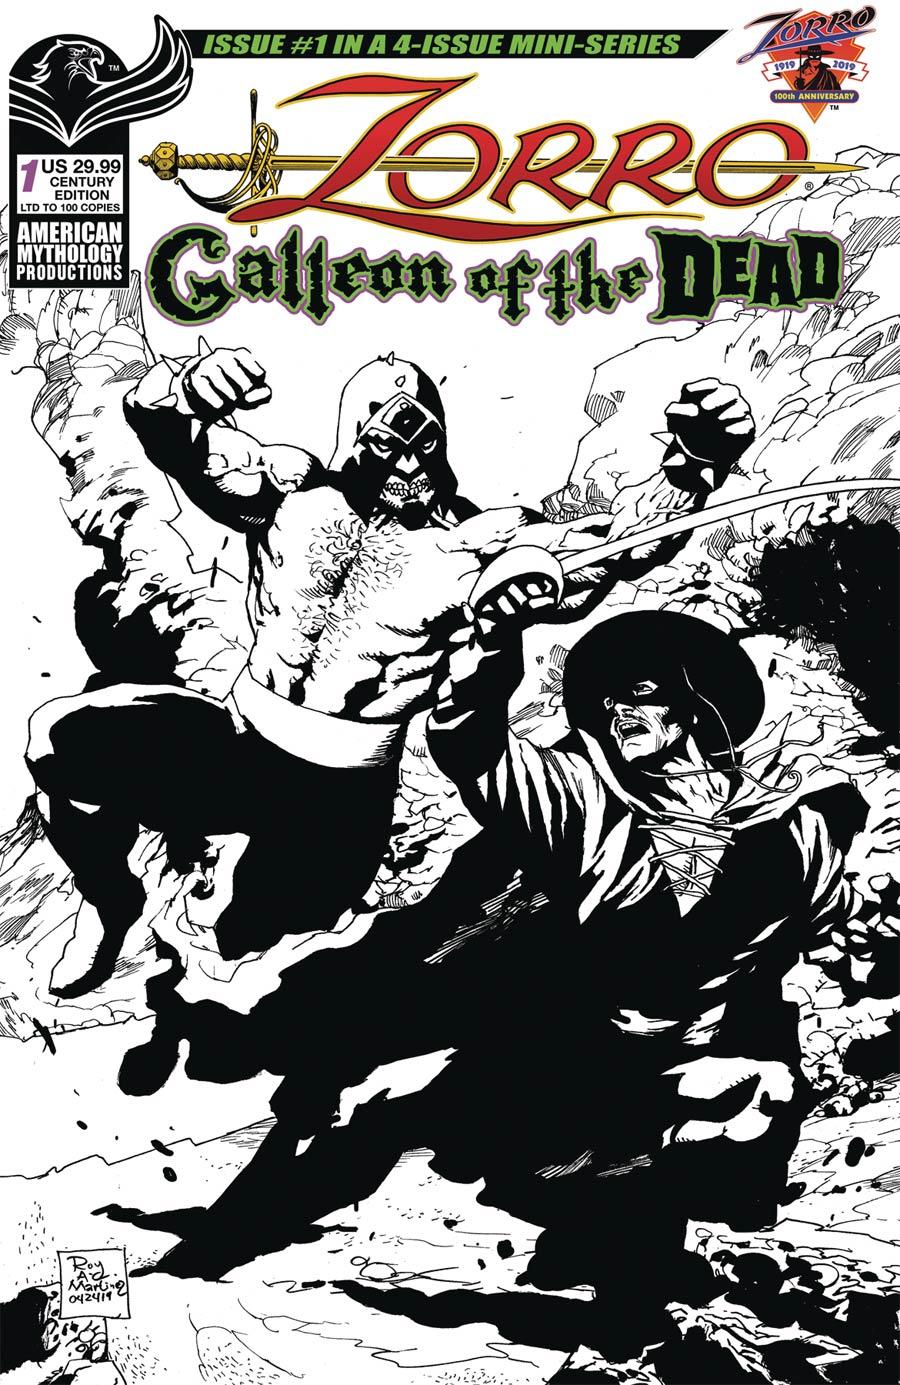 Zorro Galleon Of The Dead #1 Cover D Limited Edition Roy Allan Martinez Century Cover